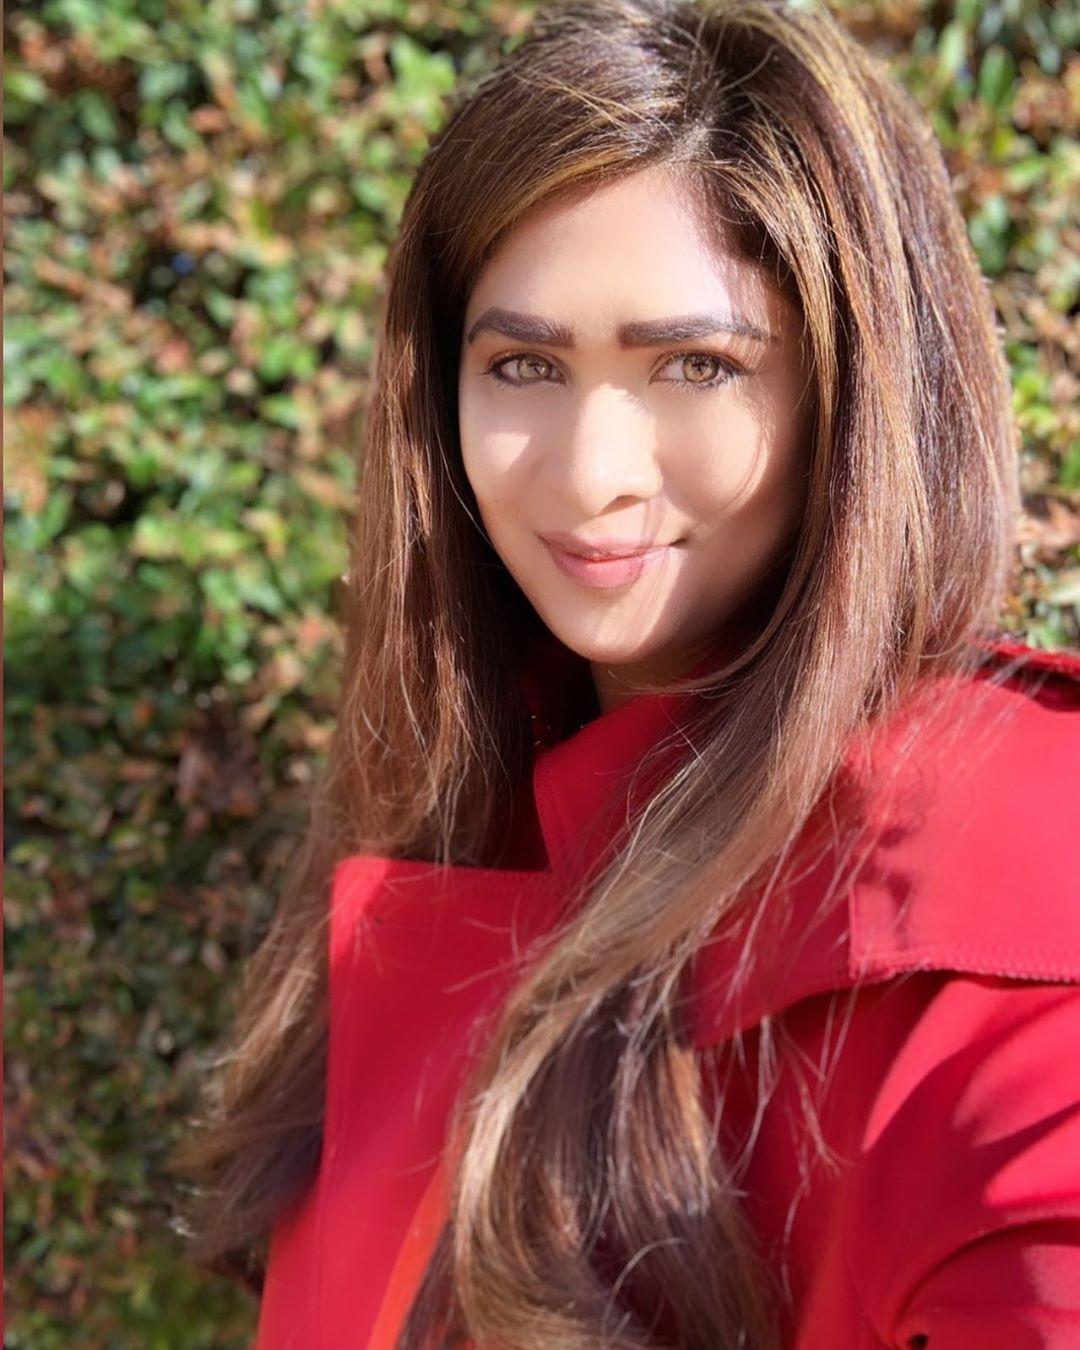 Anarkali Akarsha shri lankan actress